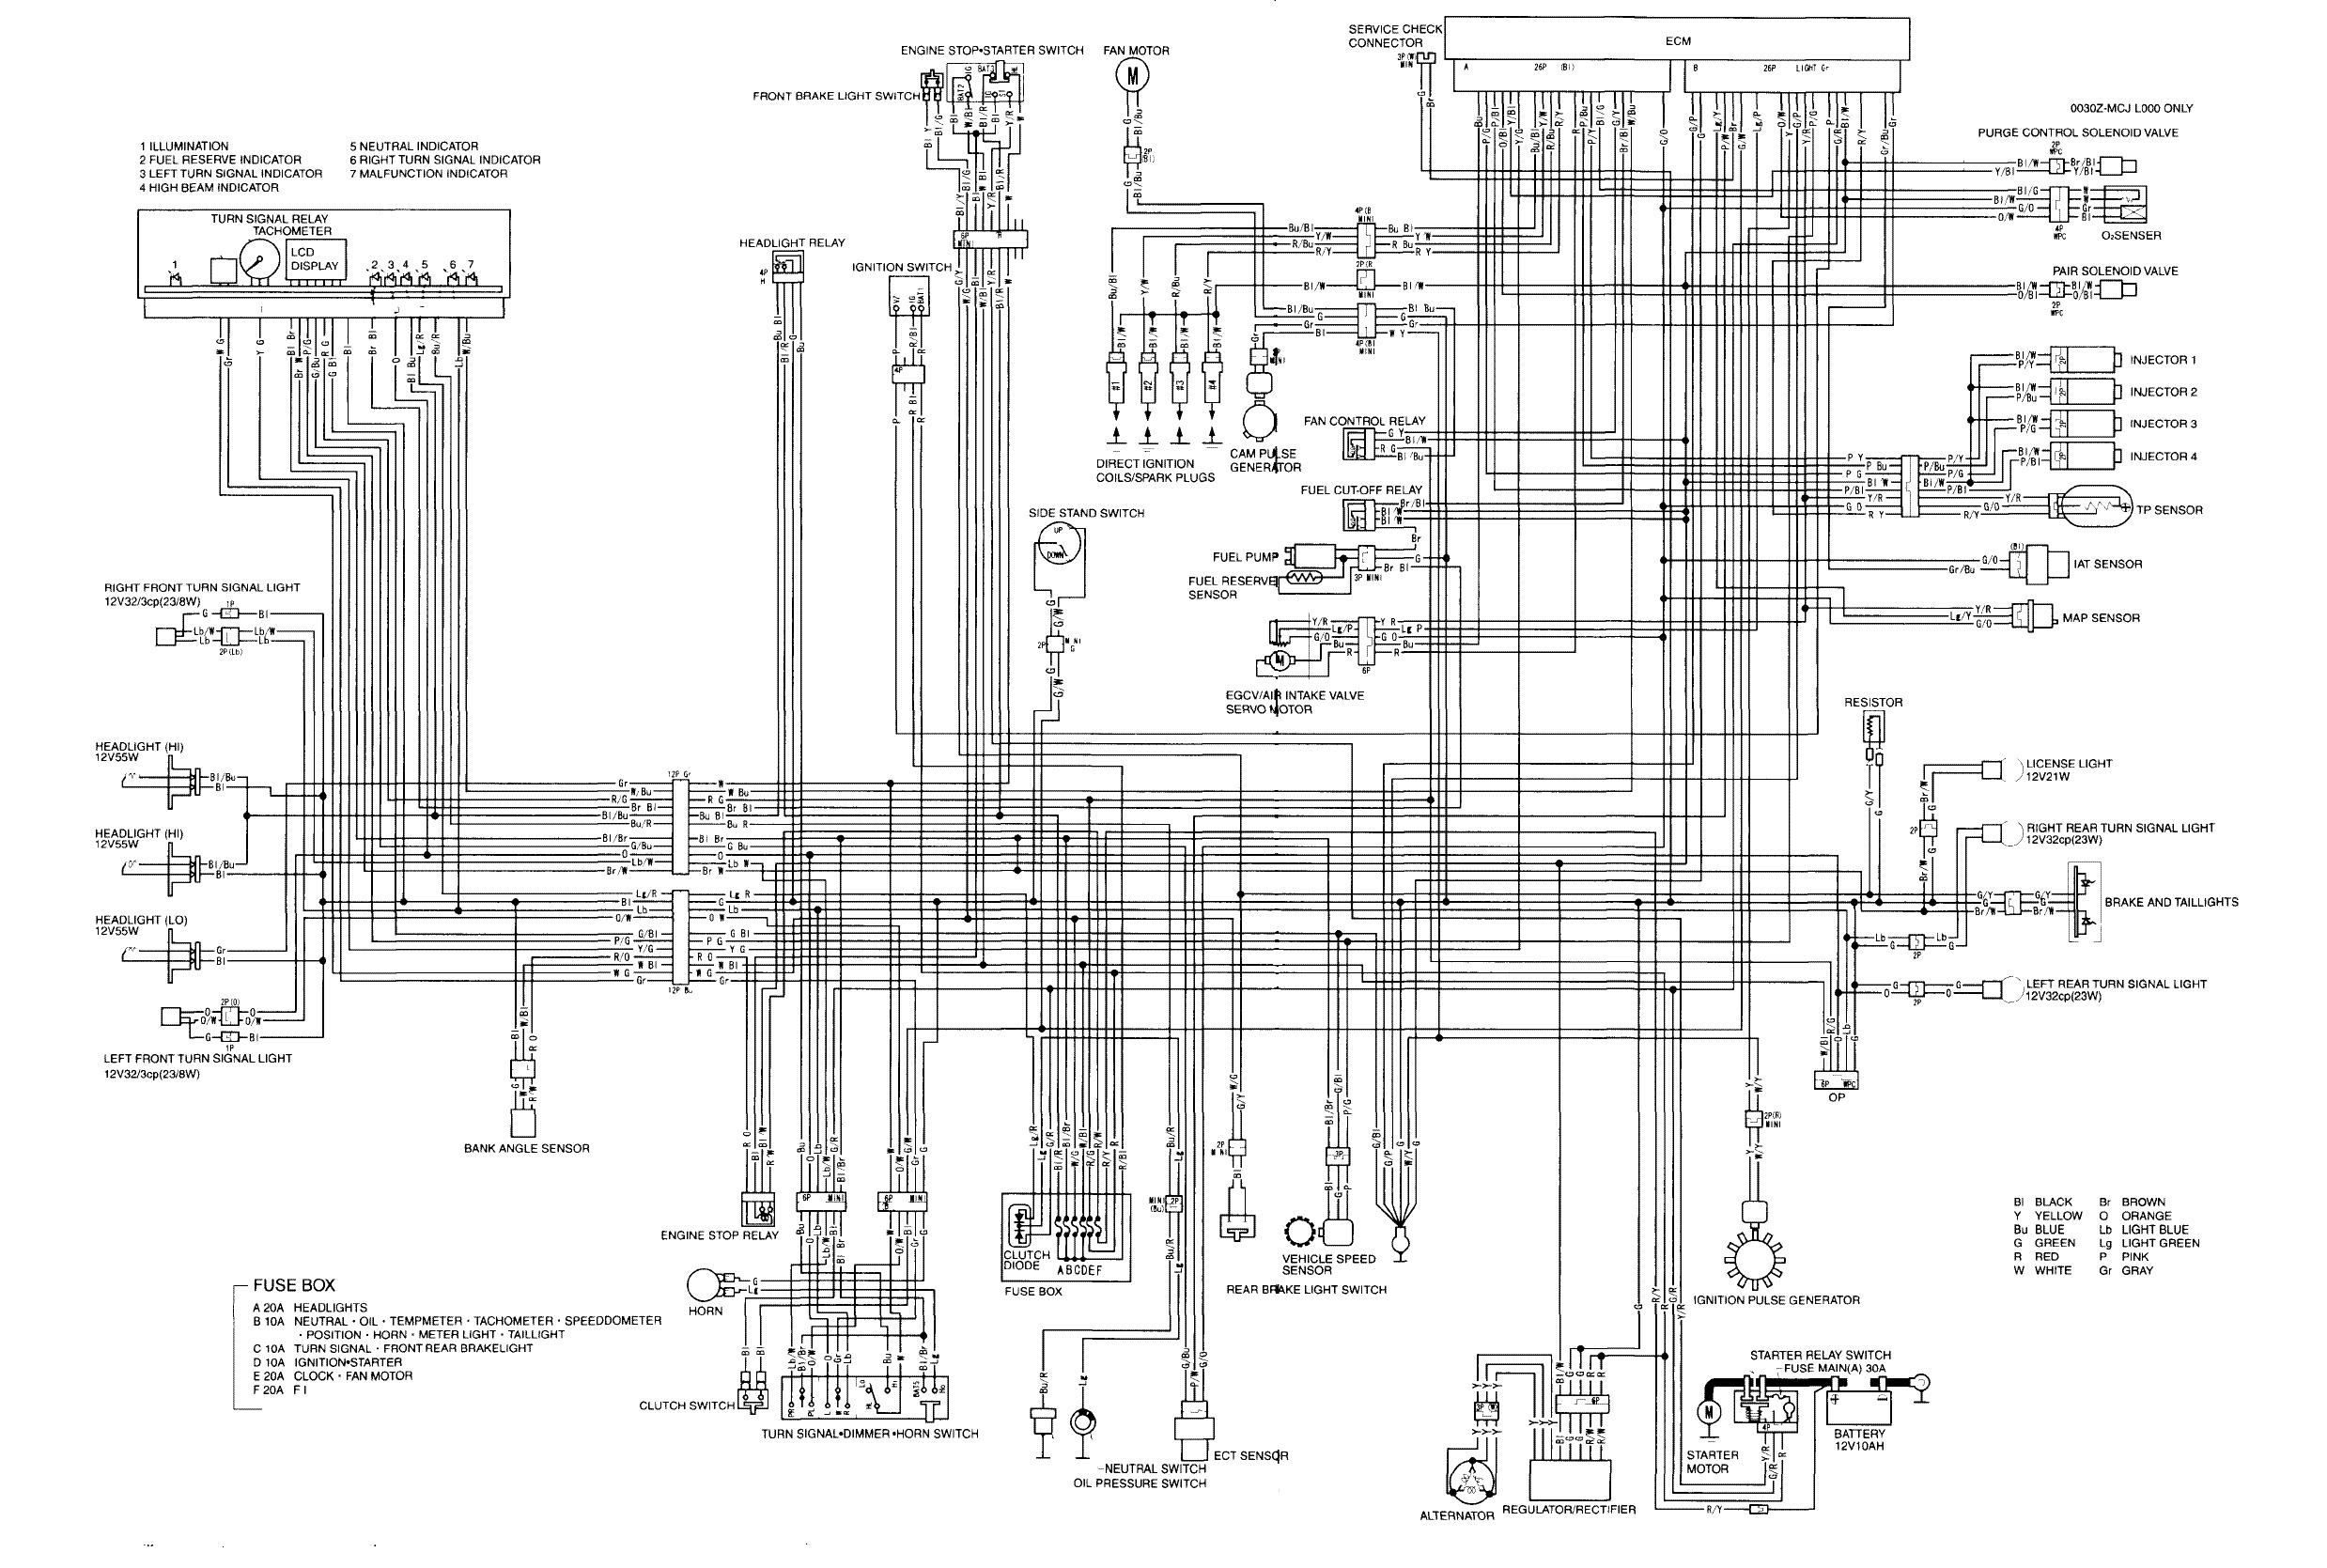 2003 Honda Cbr600rr Wiring Diagram. Honda. Auto Wiring Diagram